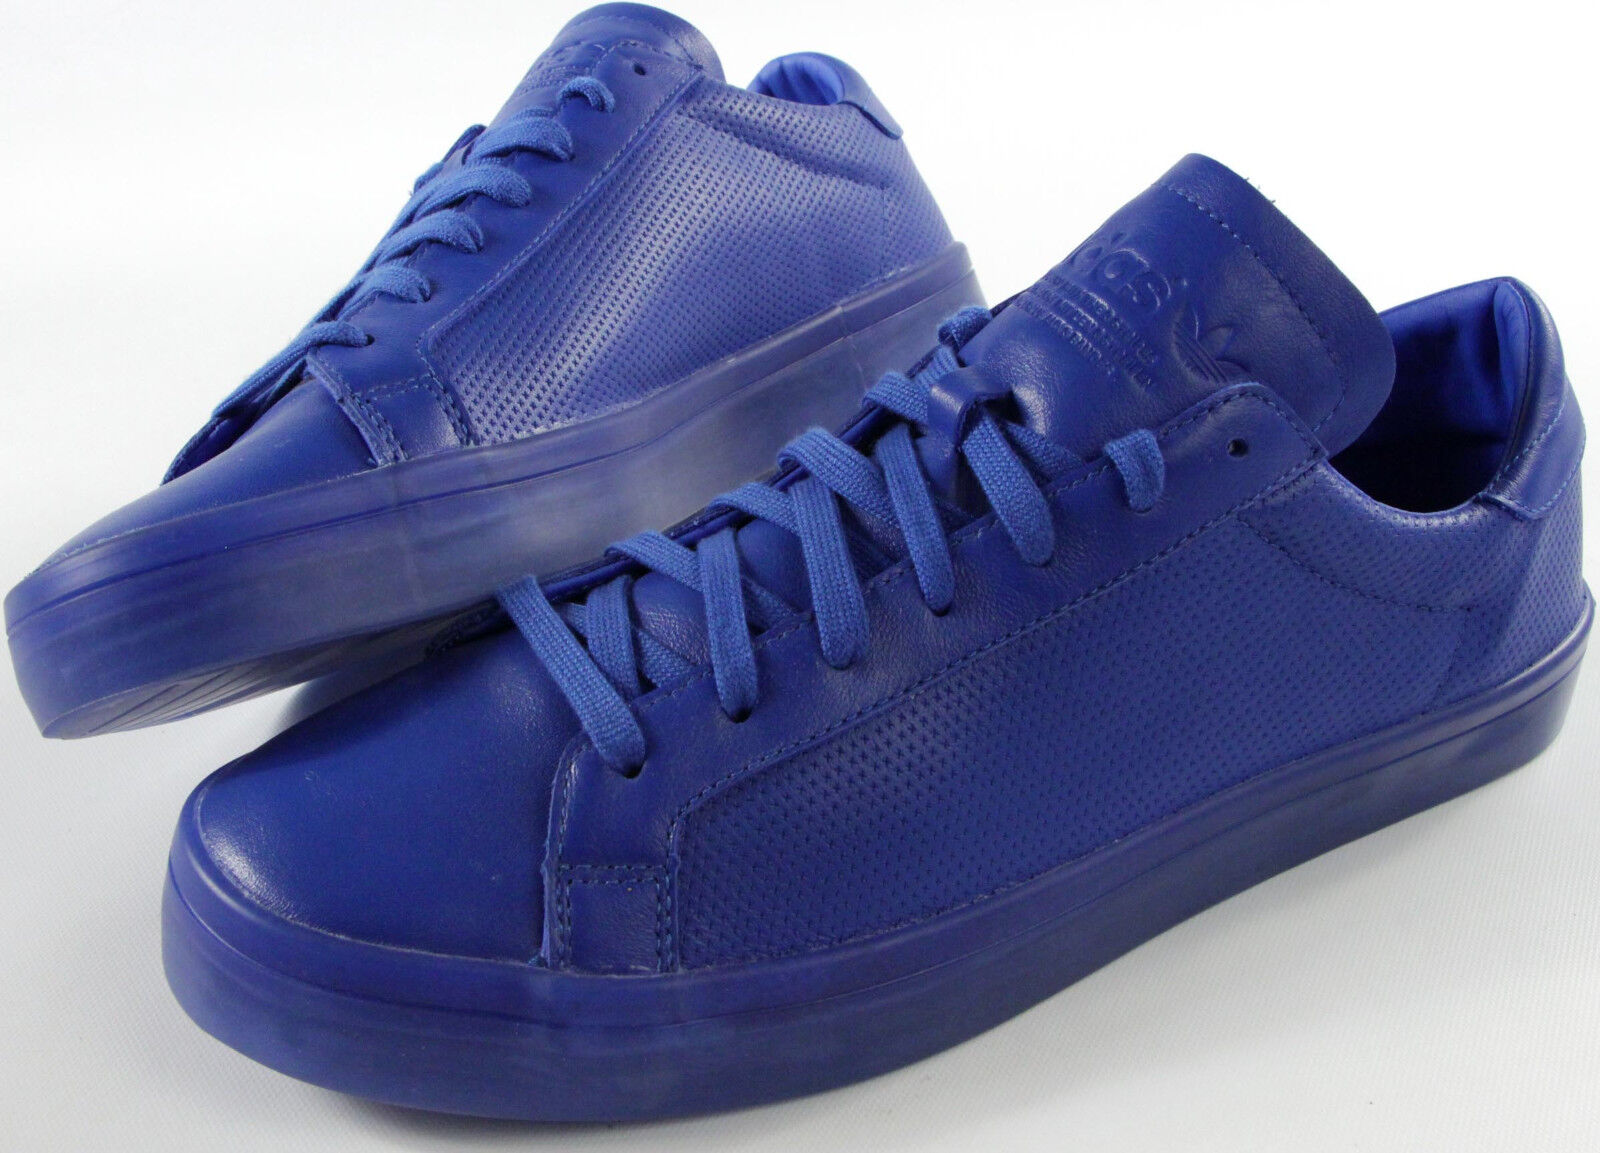 ADIDAS Originals Court Vantage Royal Schuhe - NEU - Adicolor klassische blaue Turnschuhe